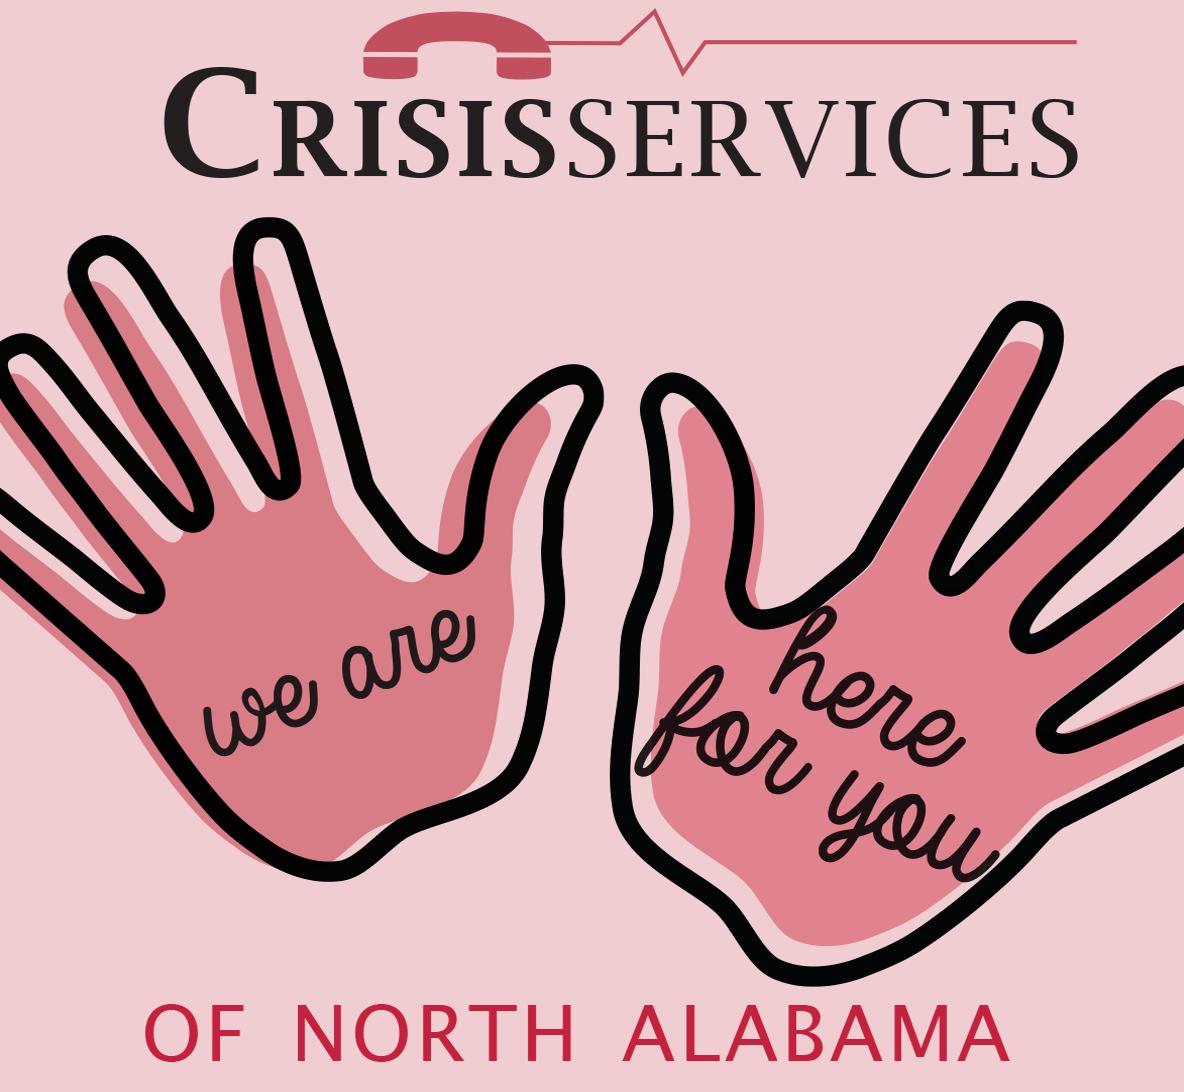 Crisis Services of North Alabama